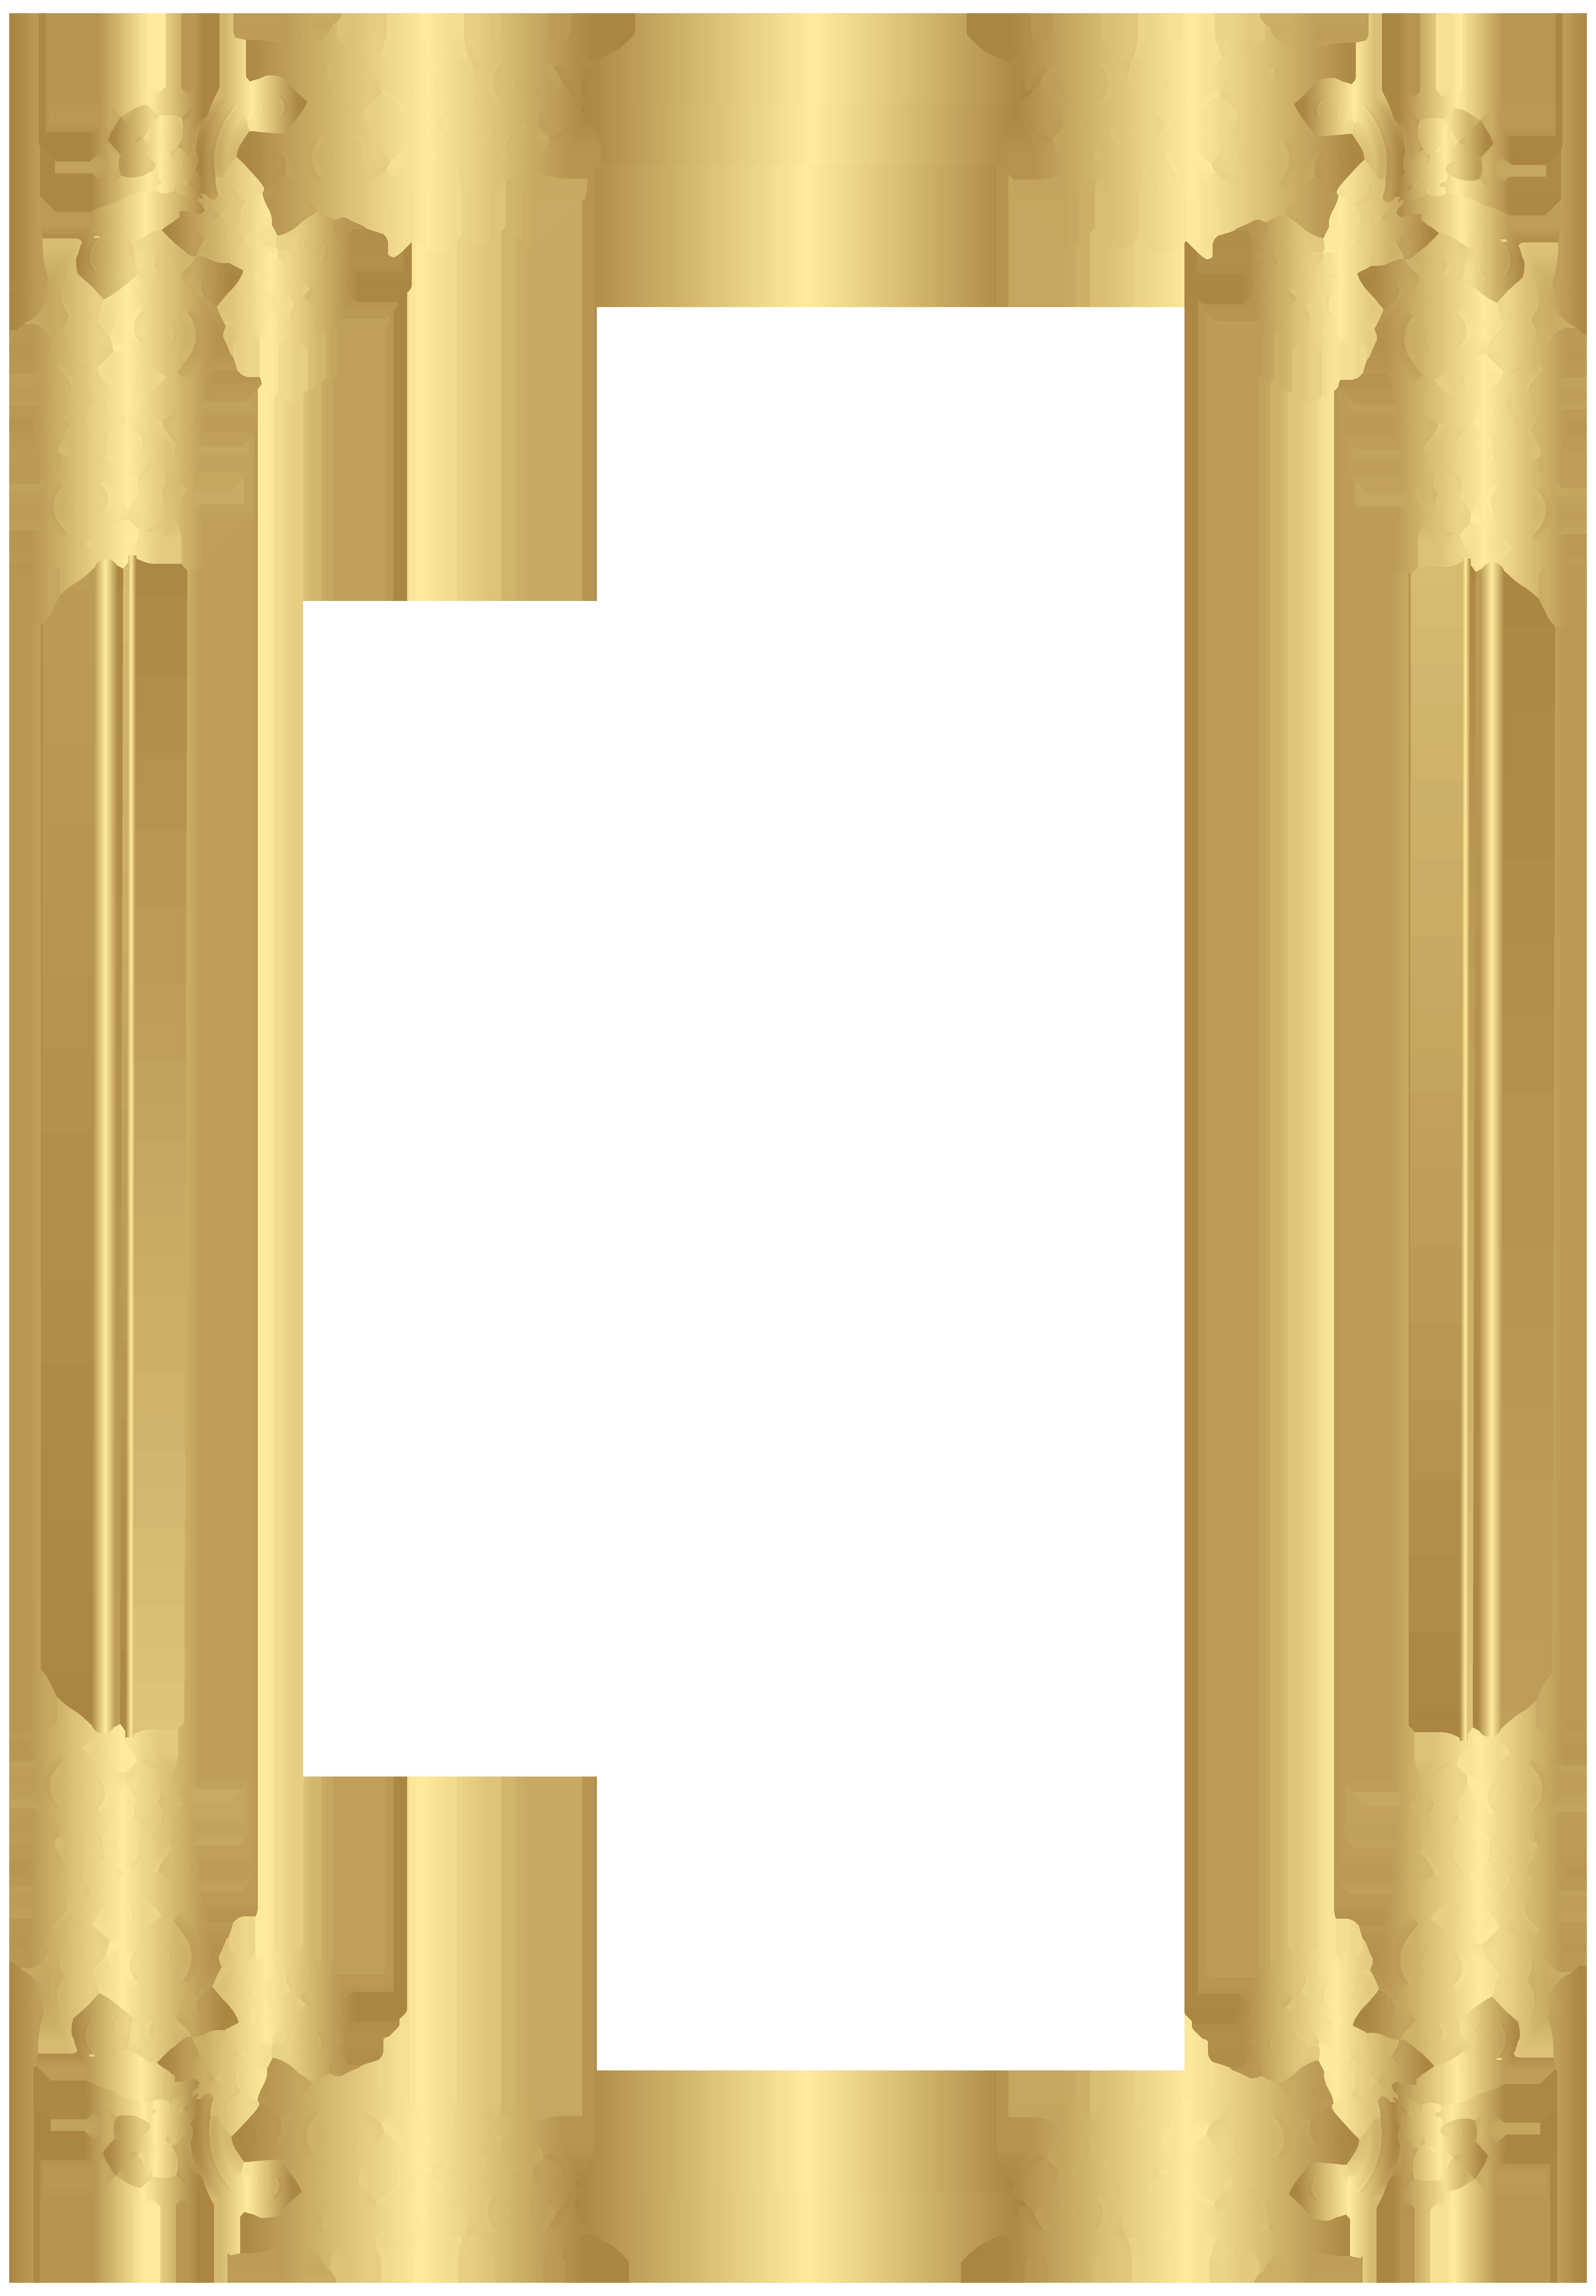 Frames clipart decorative. Border frame clip art